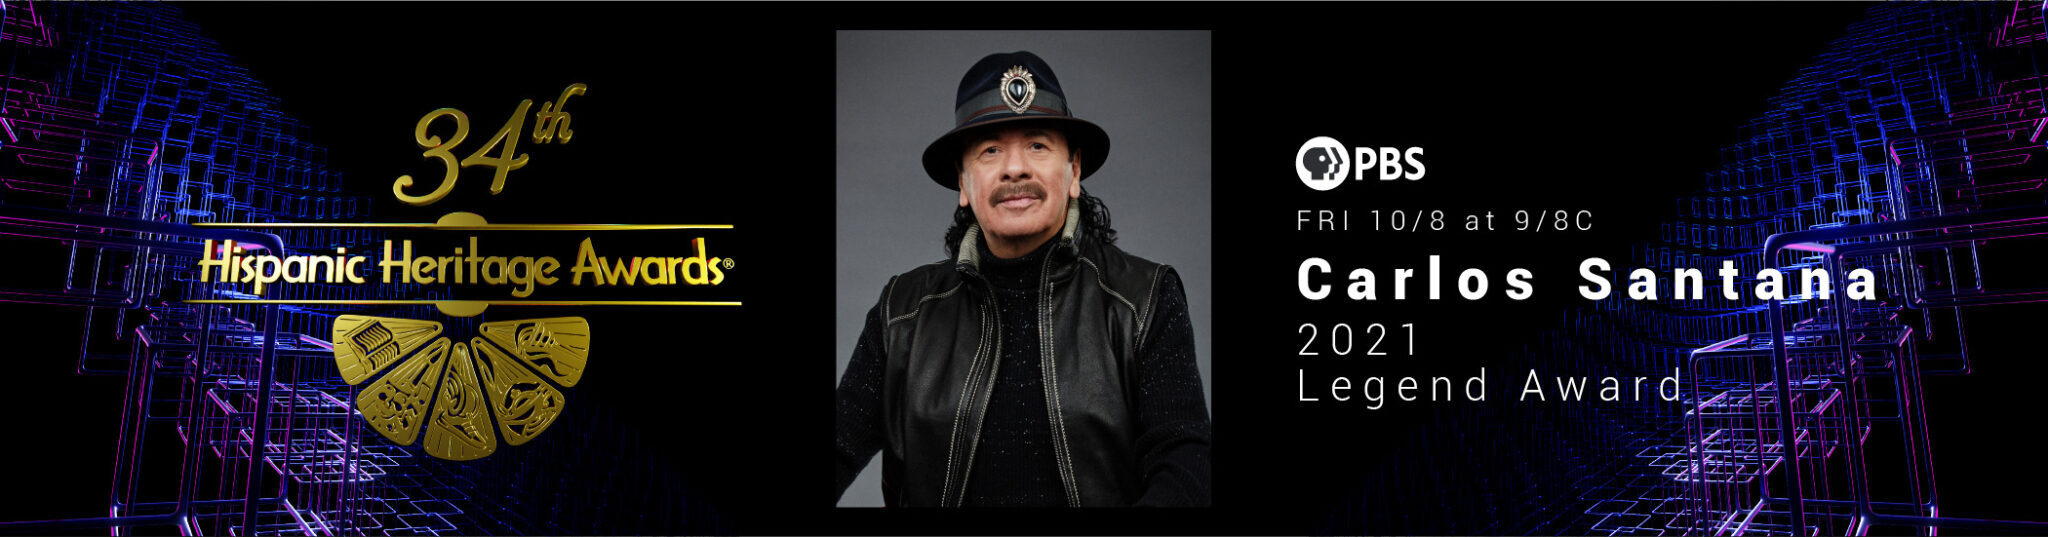 34th Hispanic Heritage Awards PBS Carlos Santana